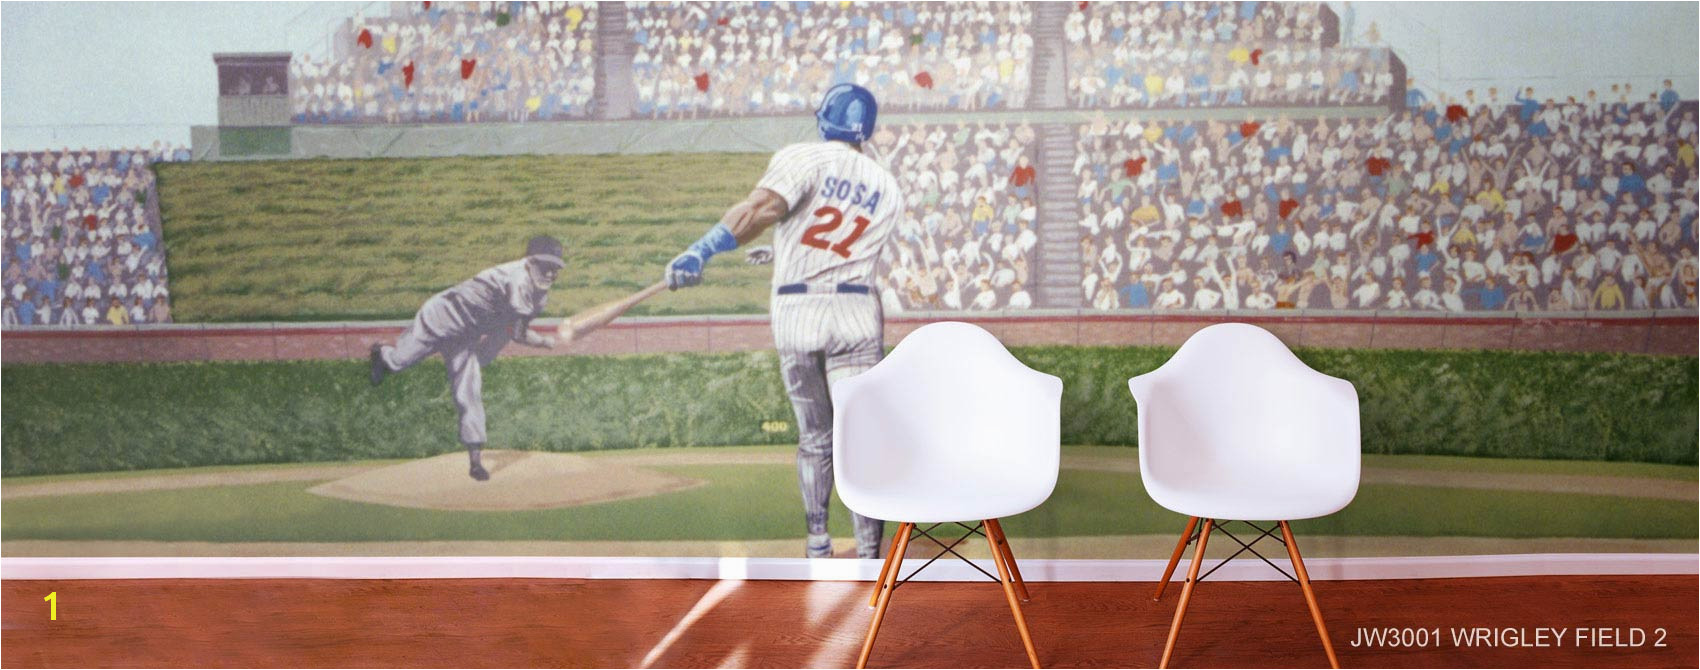 Baseball Wall Murals Wallpaper Your Way